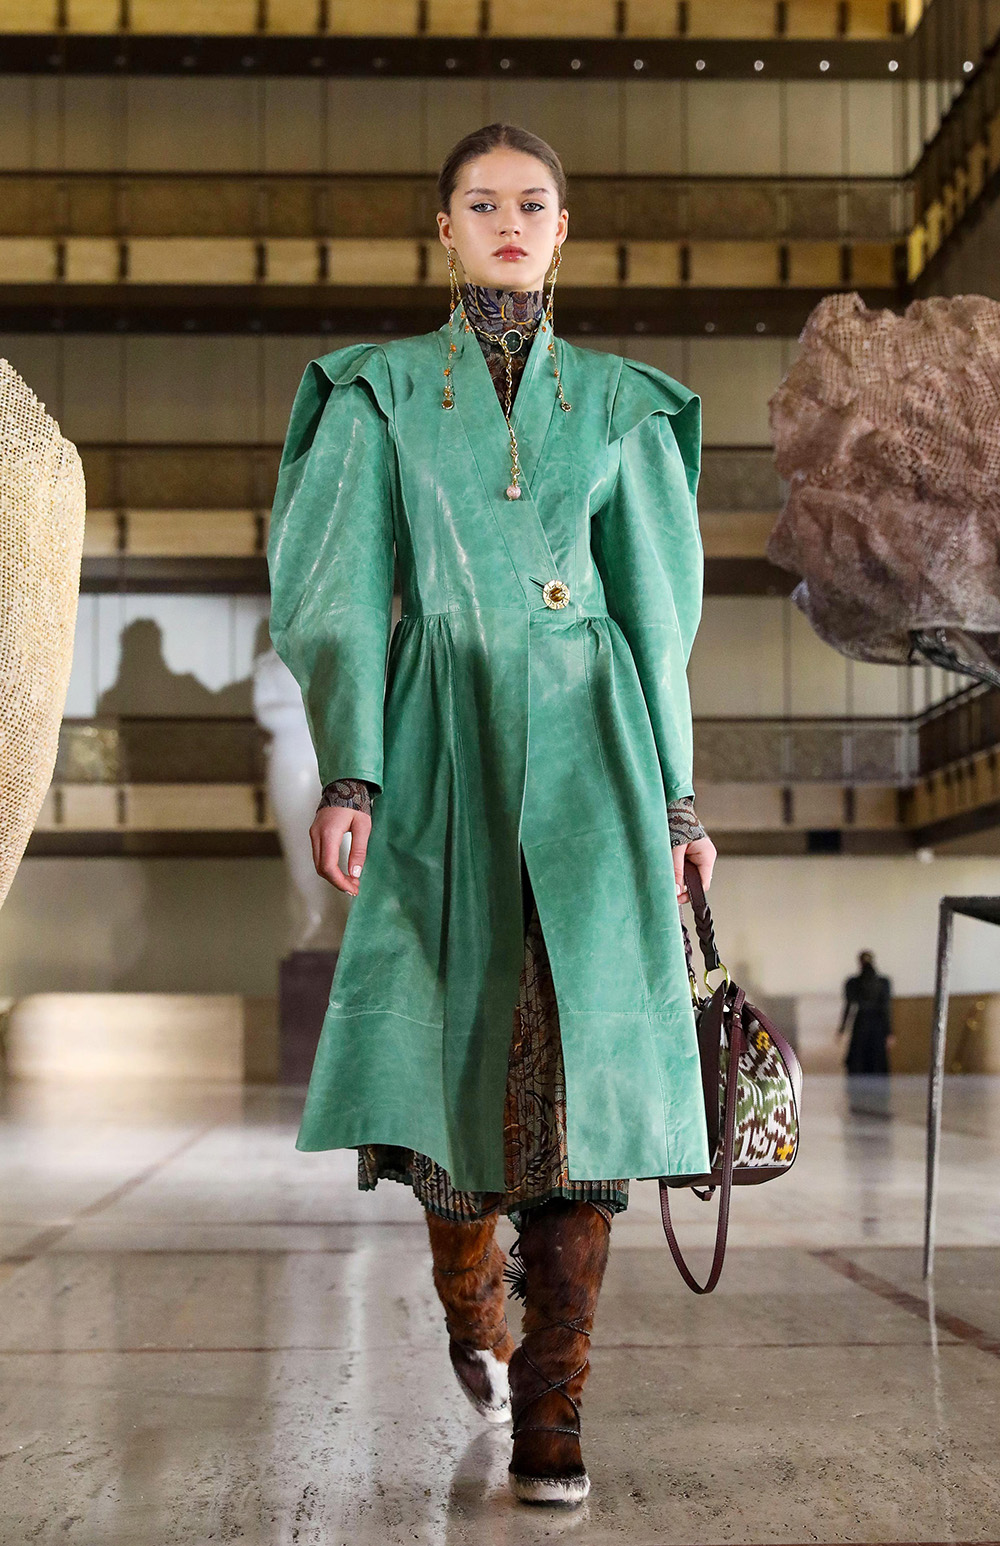 Best NYFW Looks I Ulla Johnson Fall 2021 Collection #fashionista #fashionblog